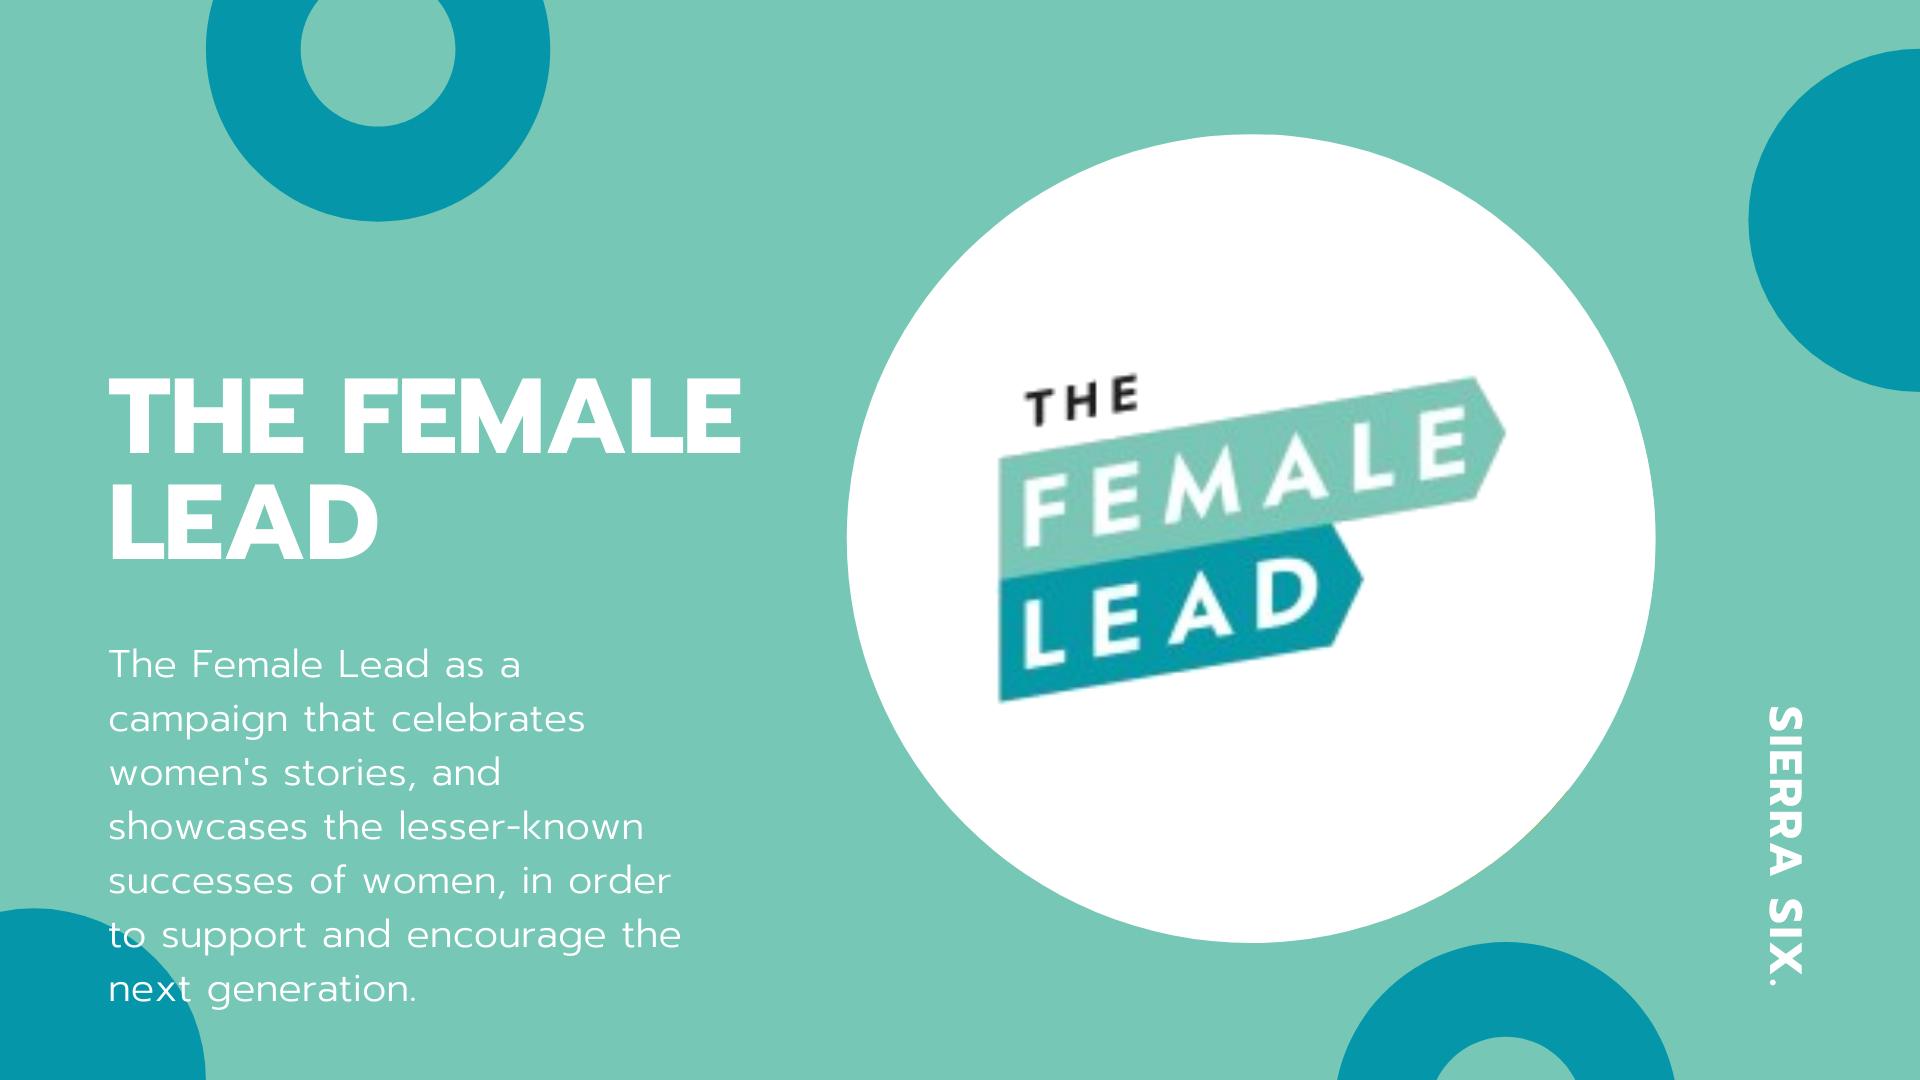 Sierra Six Media, SEO agency in the press: The female lead blog.